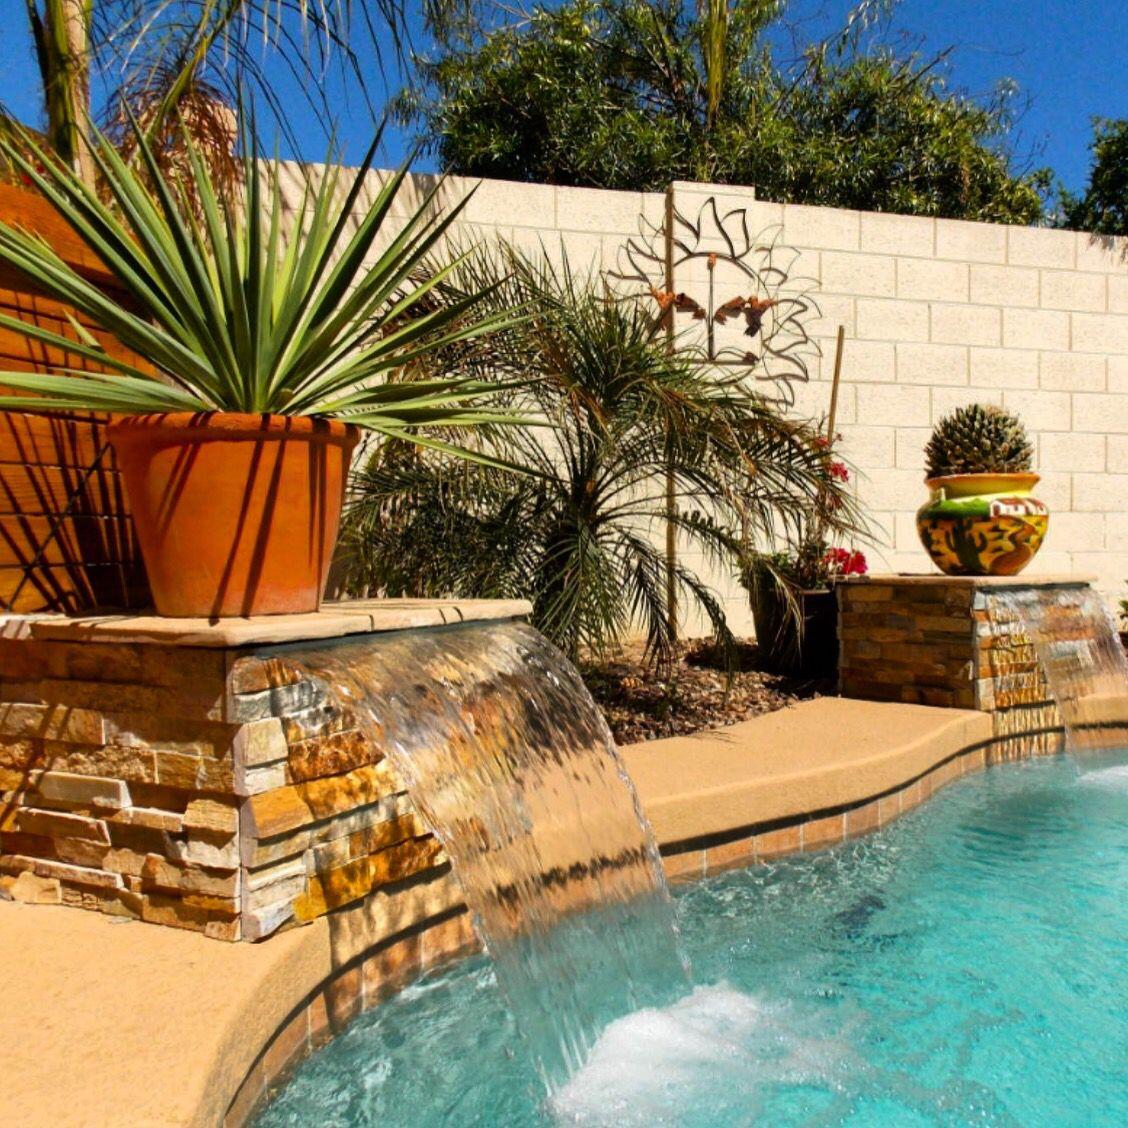 Backyard pool scottsdale real estate for sale